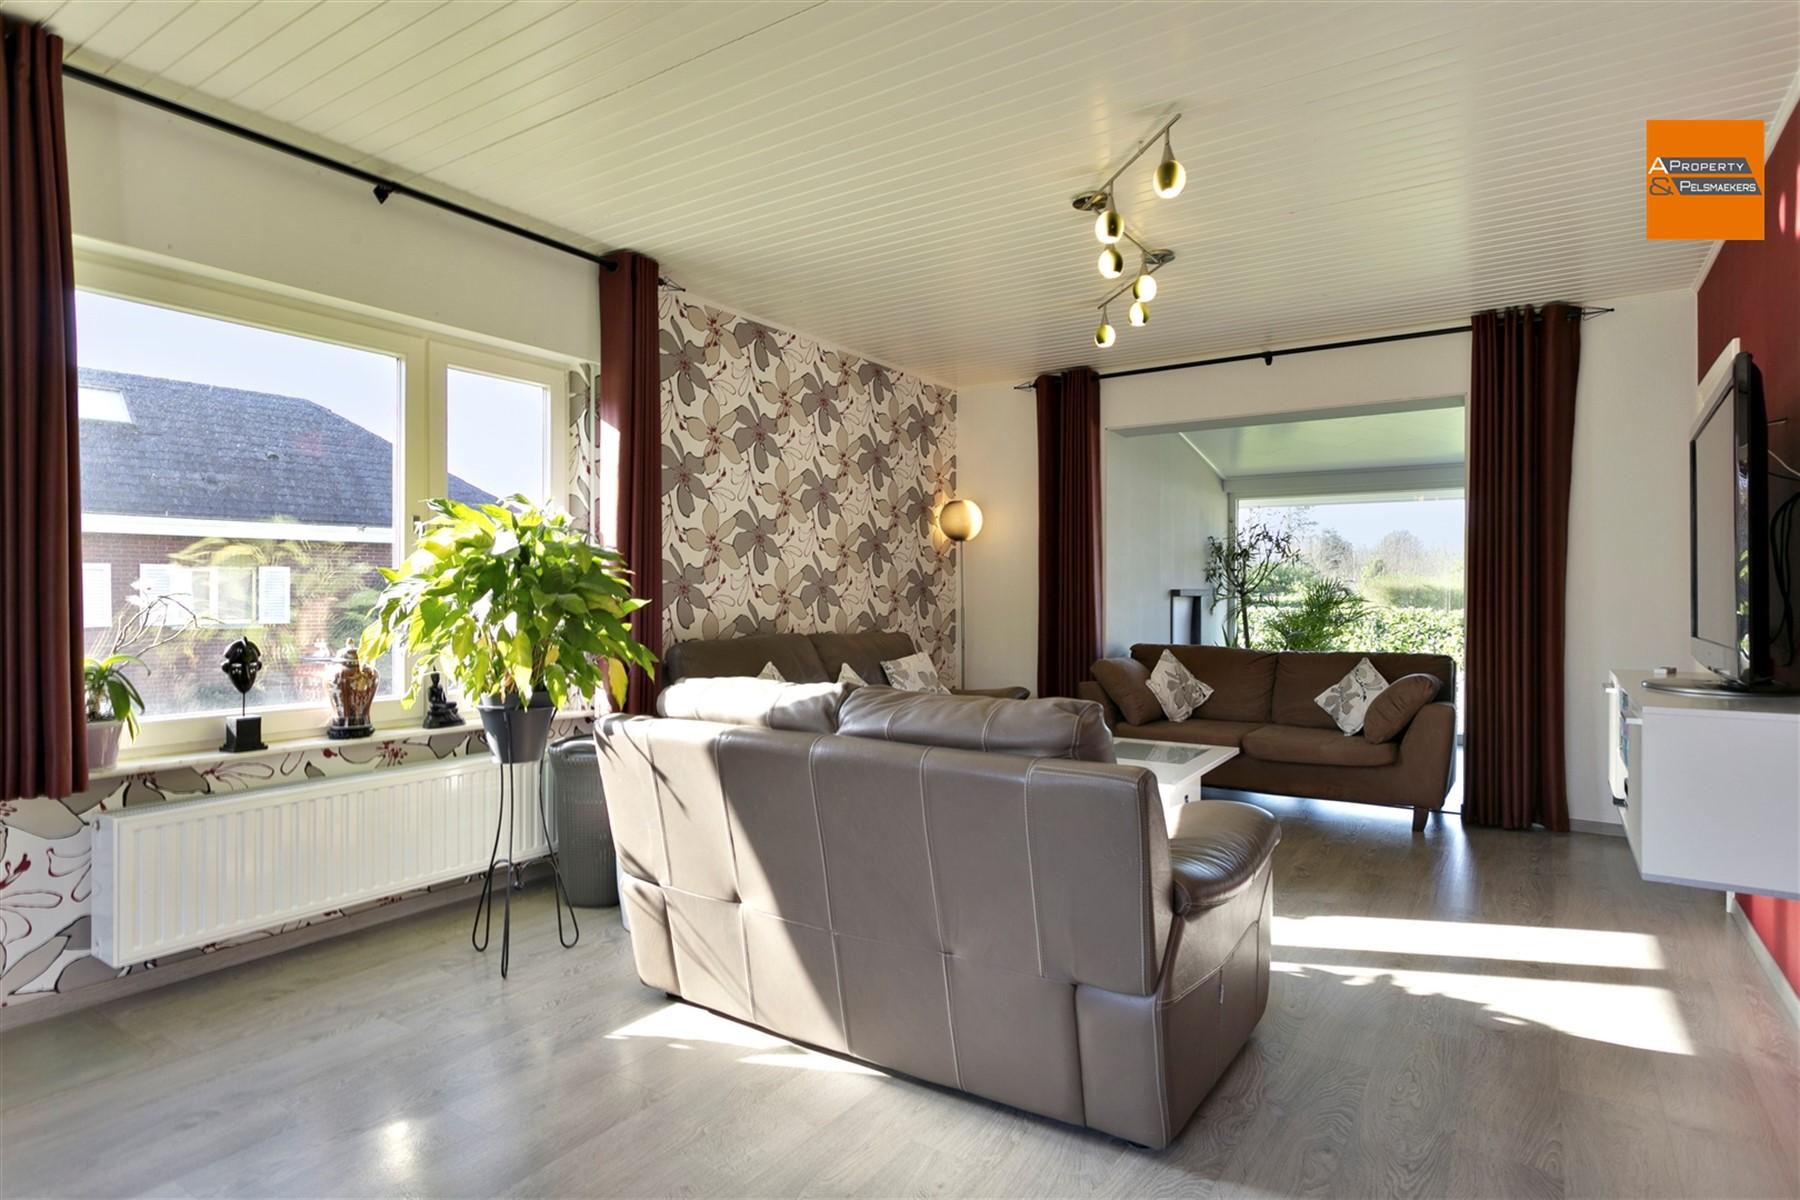 Foto 5 : Villa in 3071 KORTENBERG (België) - Prijs € 485.000